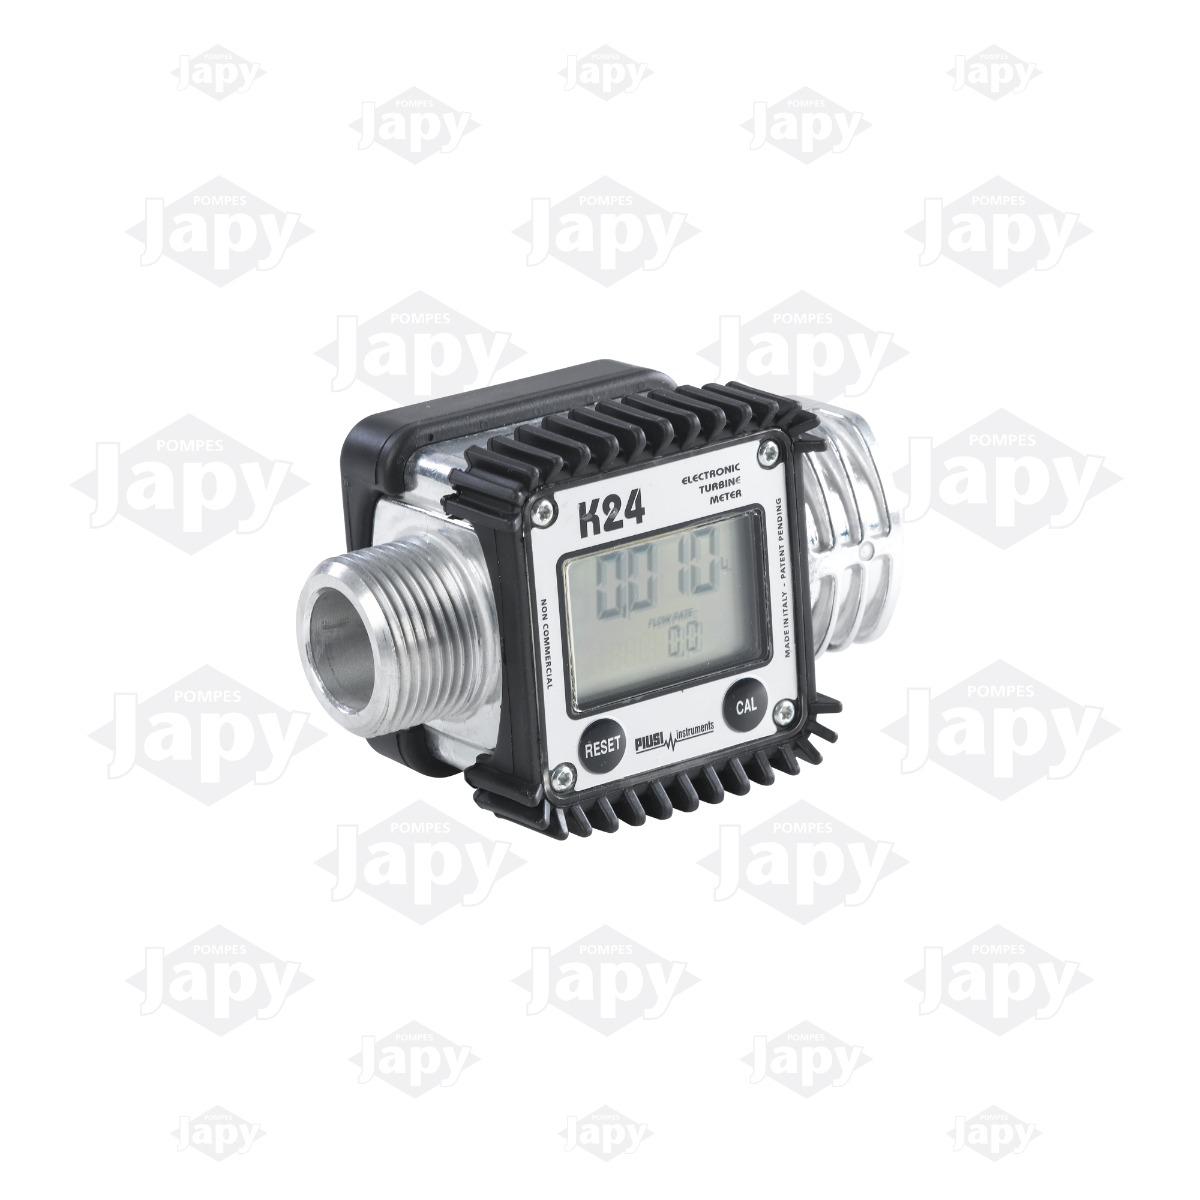 Mass Air Flow Meter& Counter:adblue, diesel,gasoline, oil